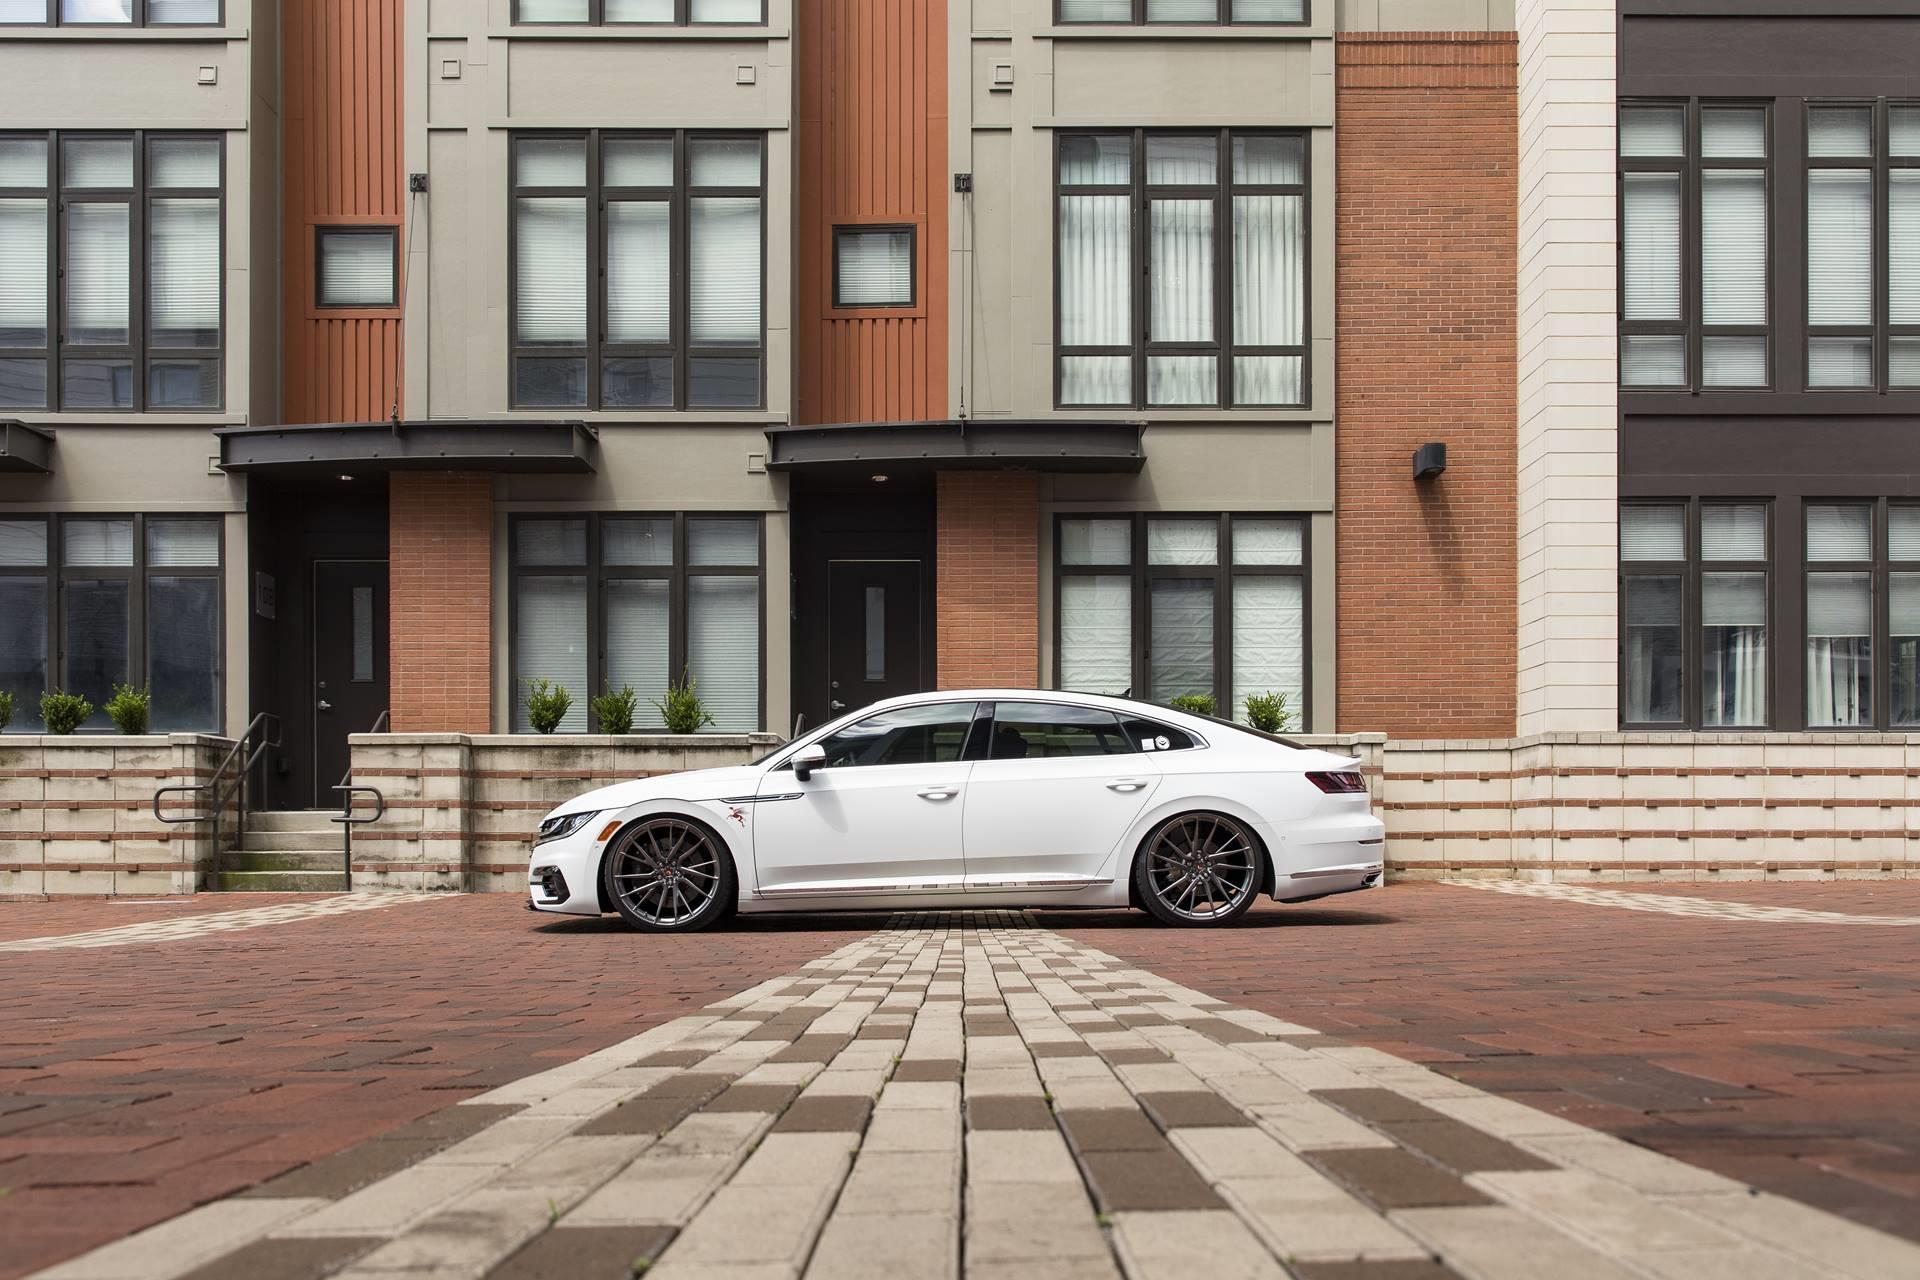 2019 Volkswagen Arteon R Line SEMA Concept News and Information 1920x1280